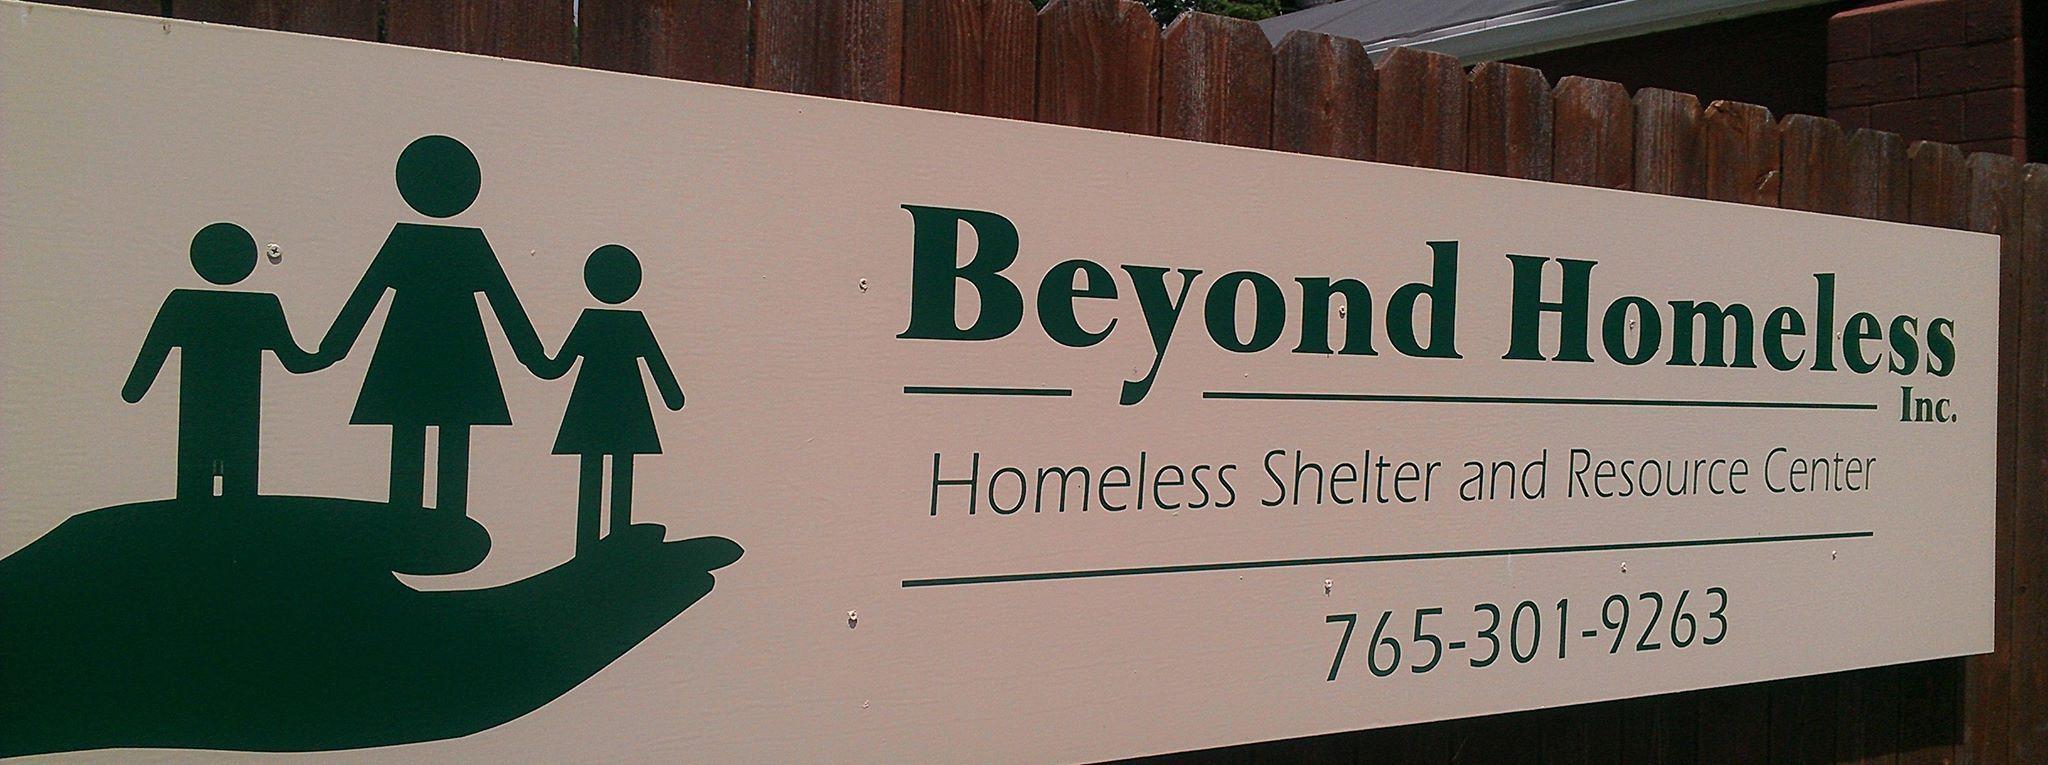 Beyond Homeless Inc